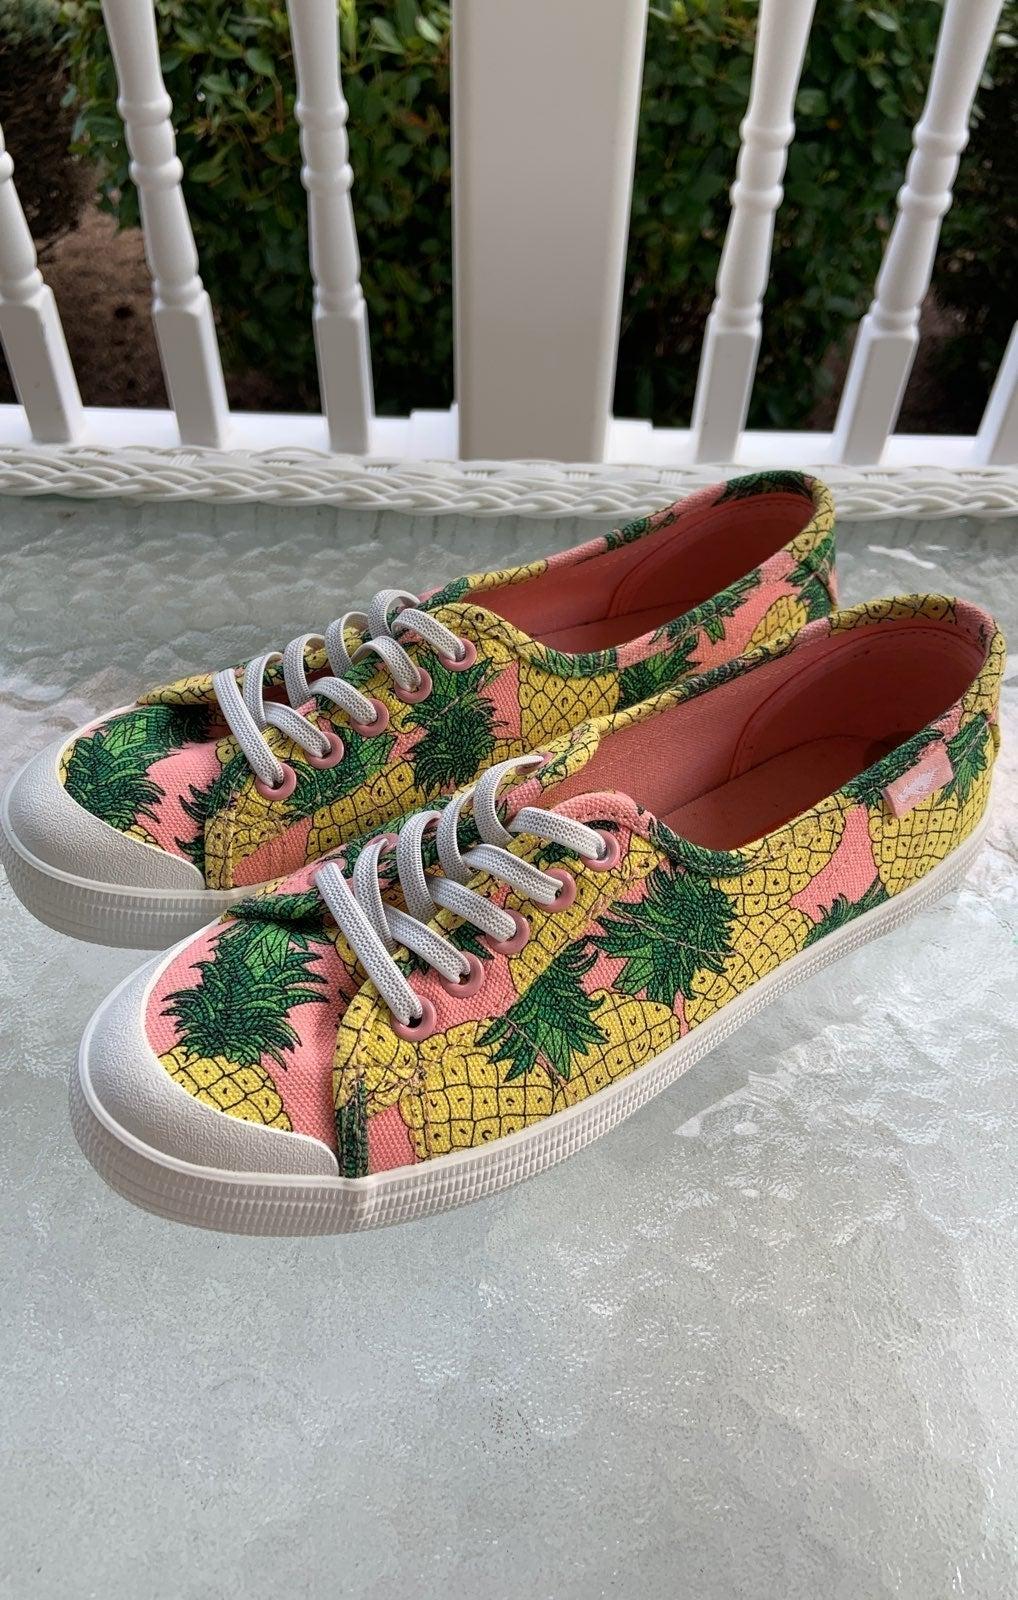 Rocket Dog Pineapple Sneakers Size 8